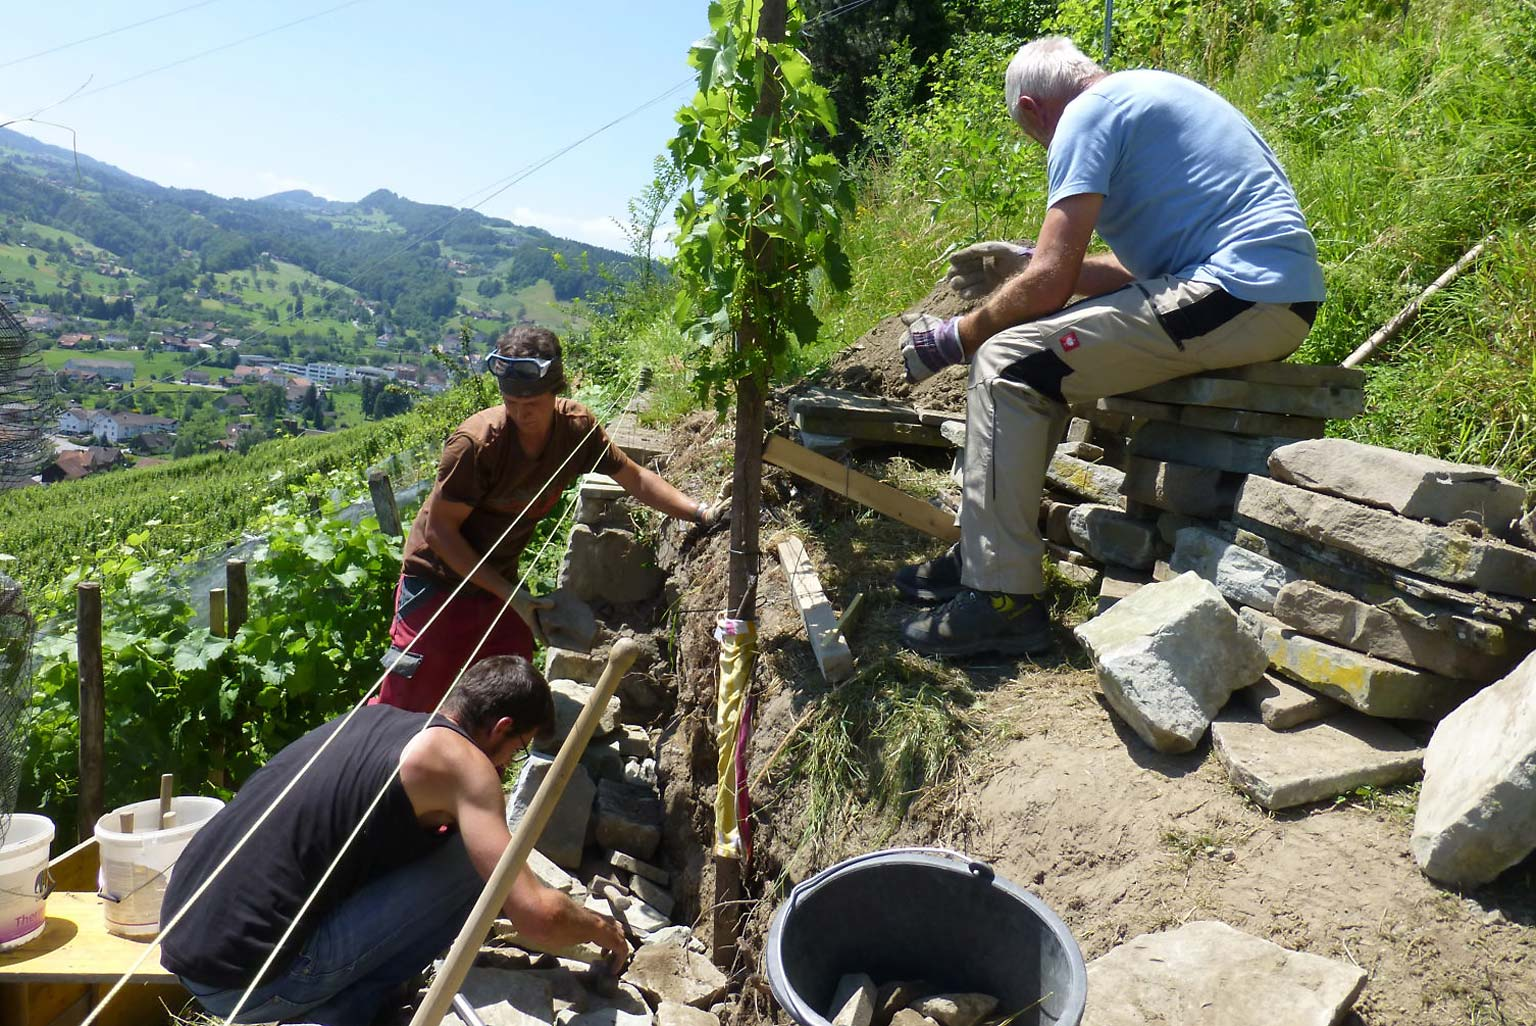 Trockenmauersanierung mit dem Profi Roman Kengelbacher